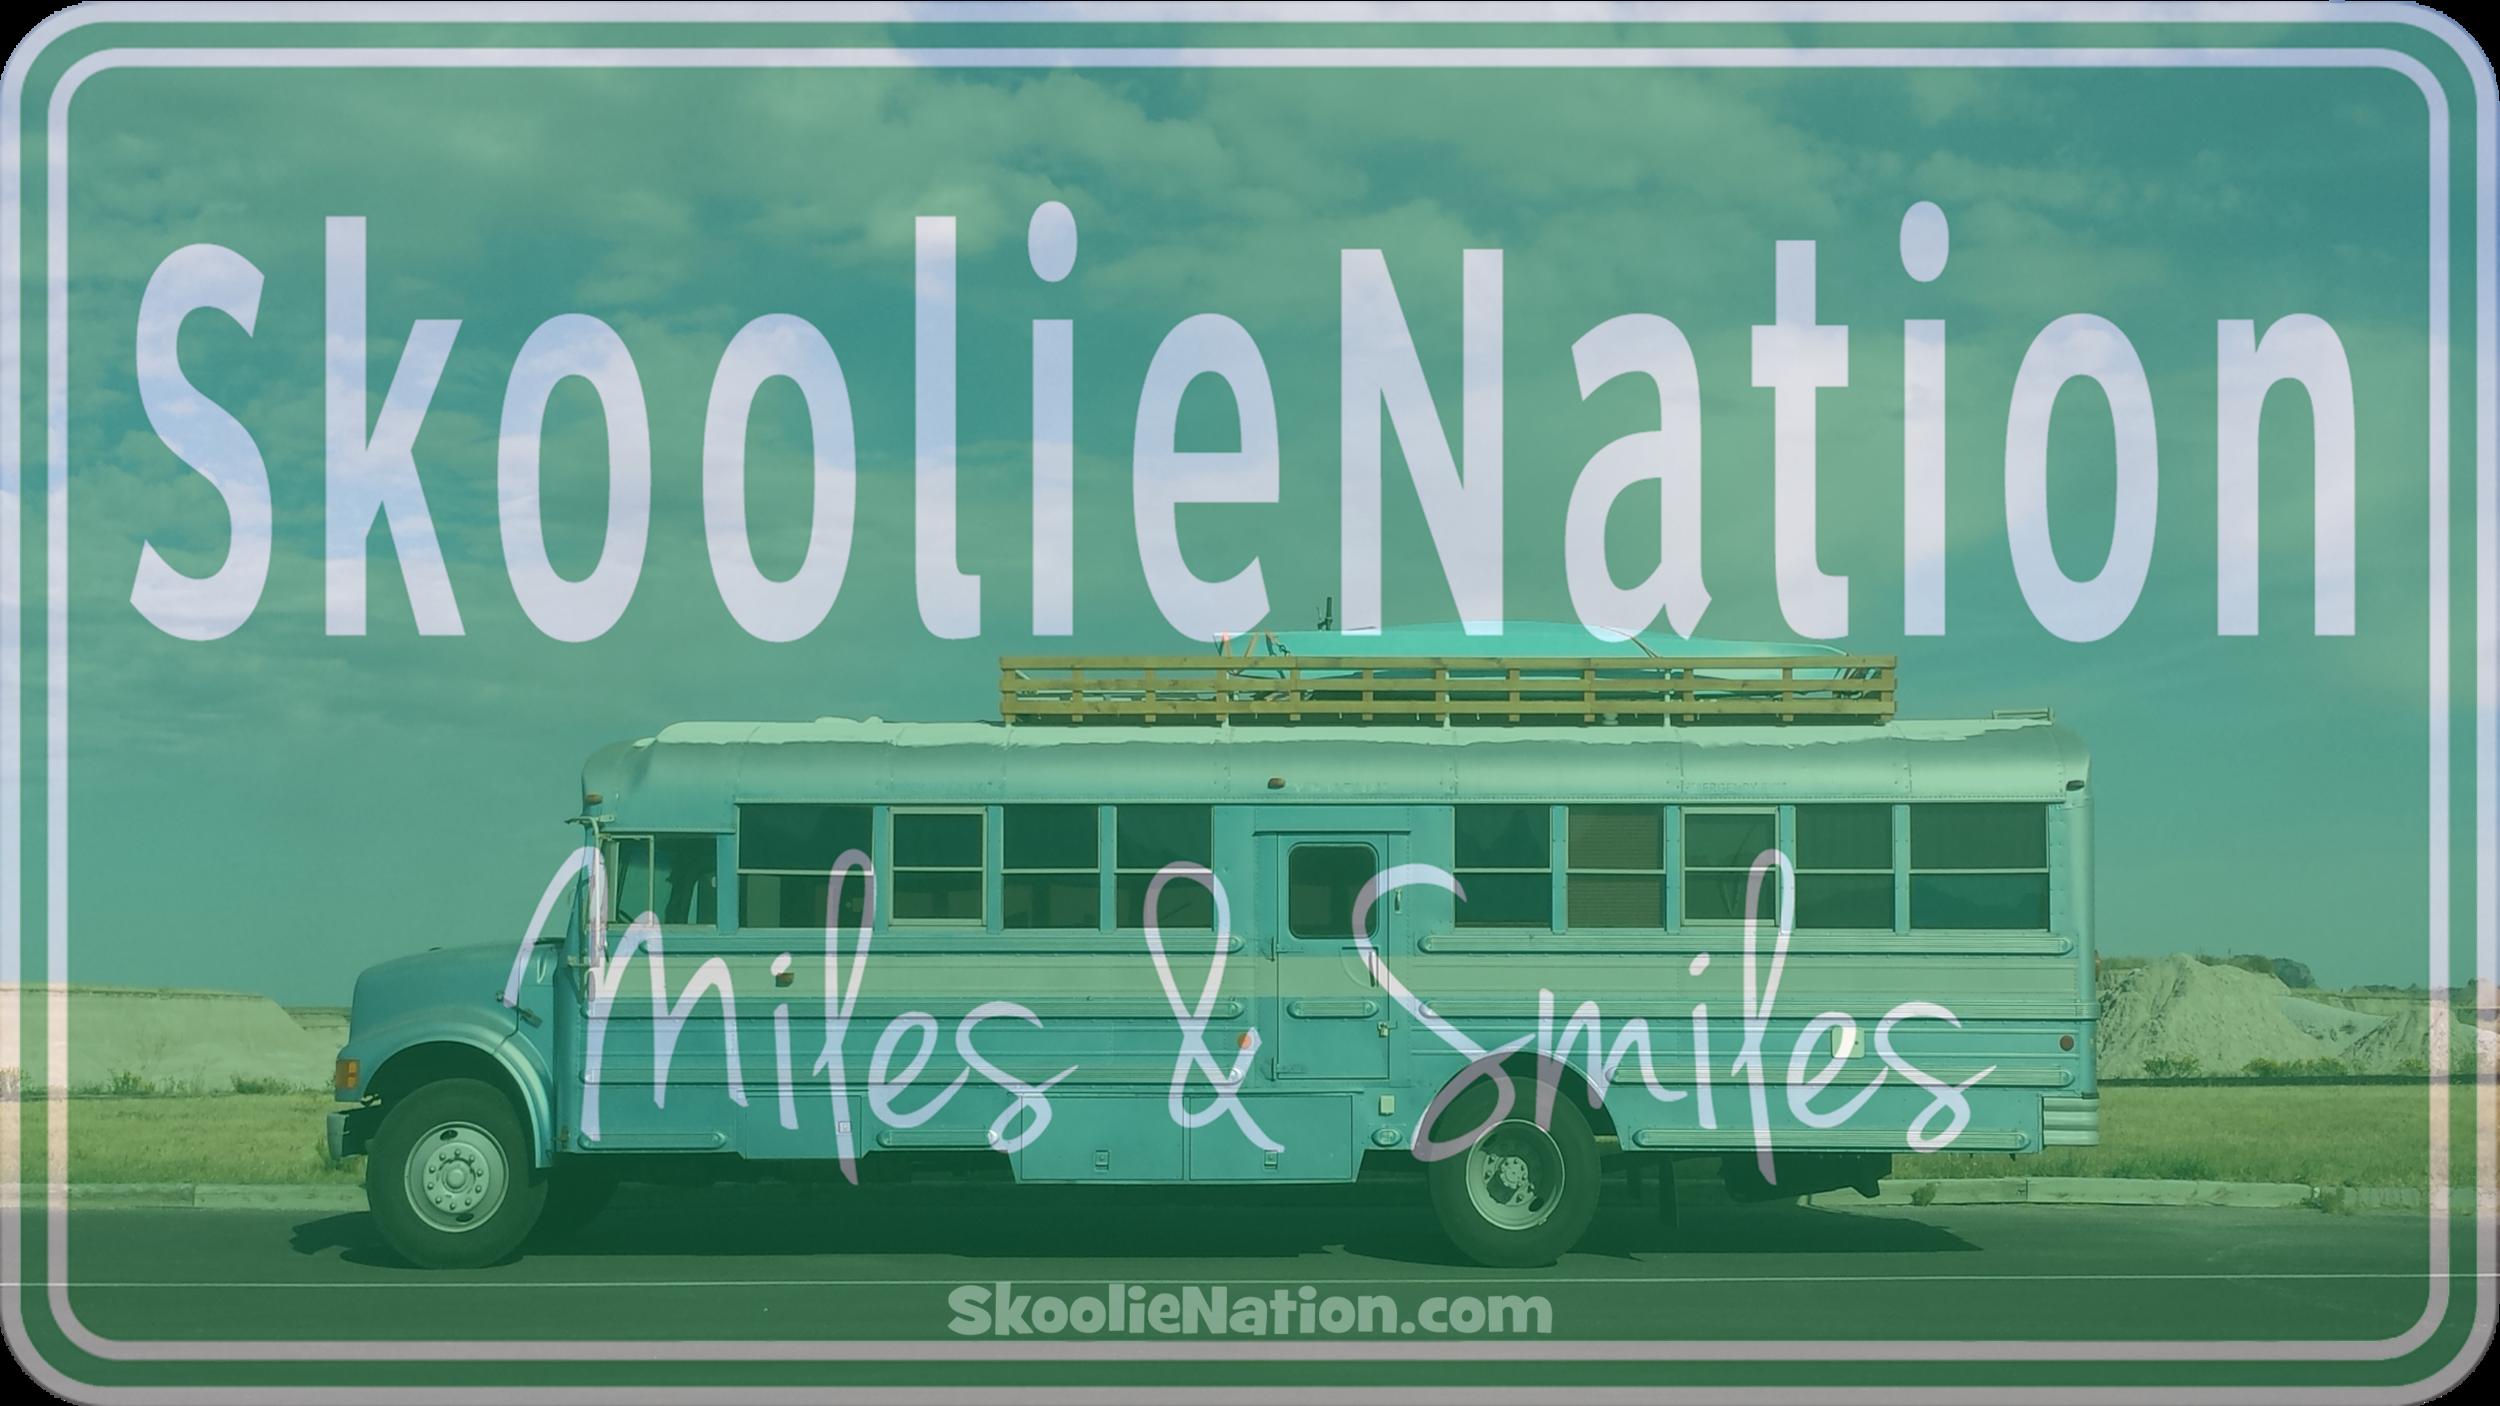 south dakota skoolienation.png